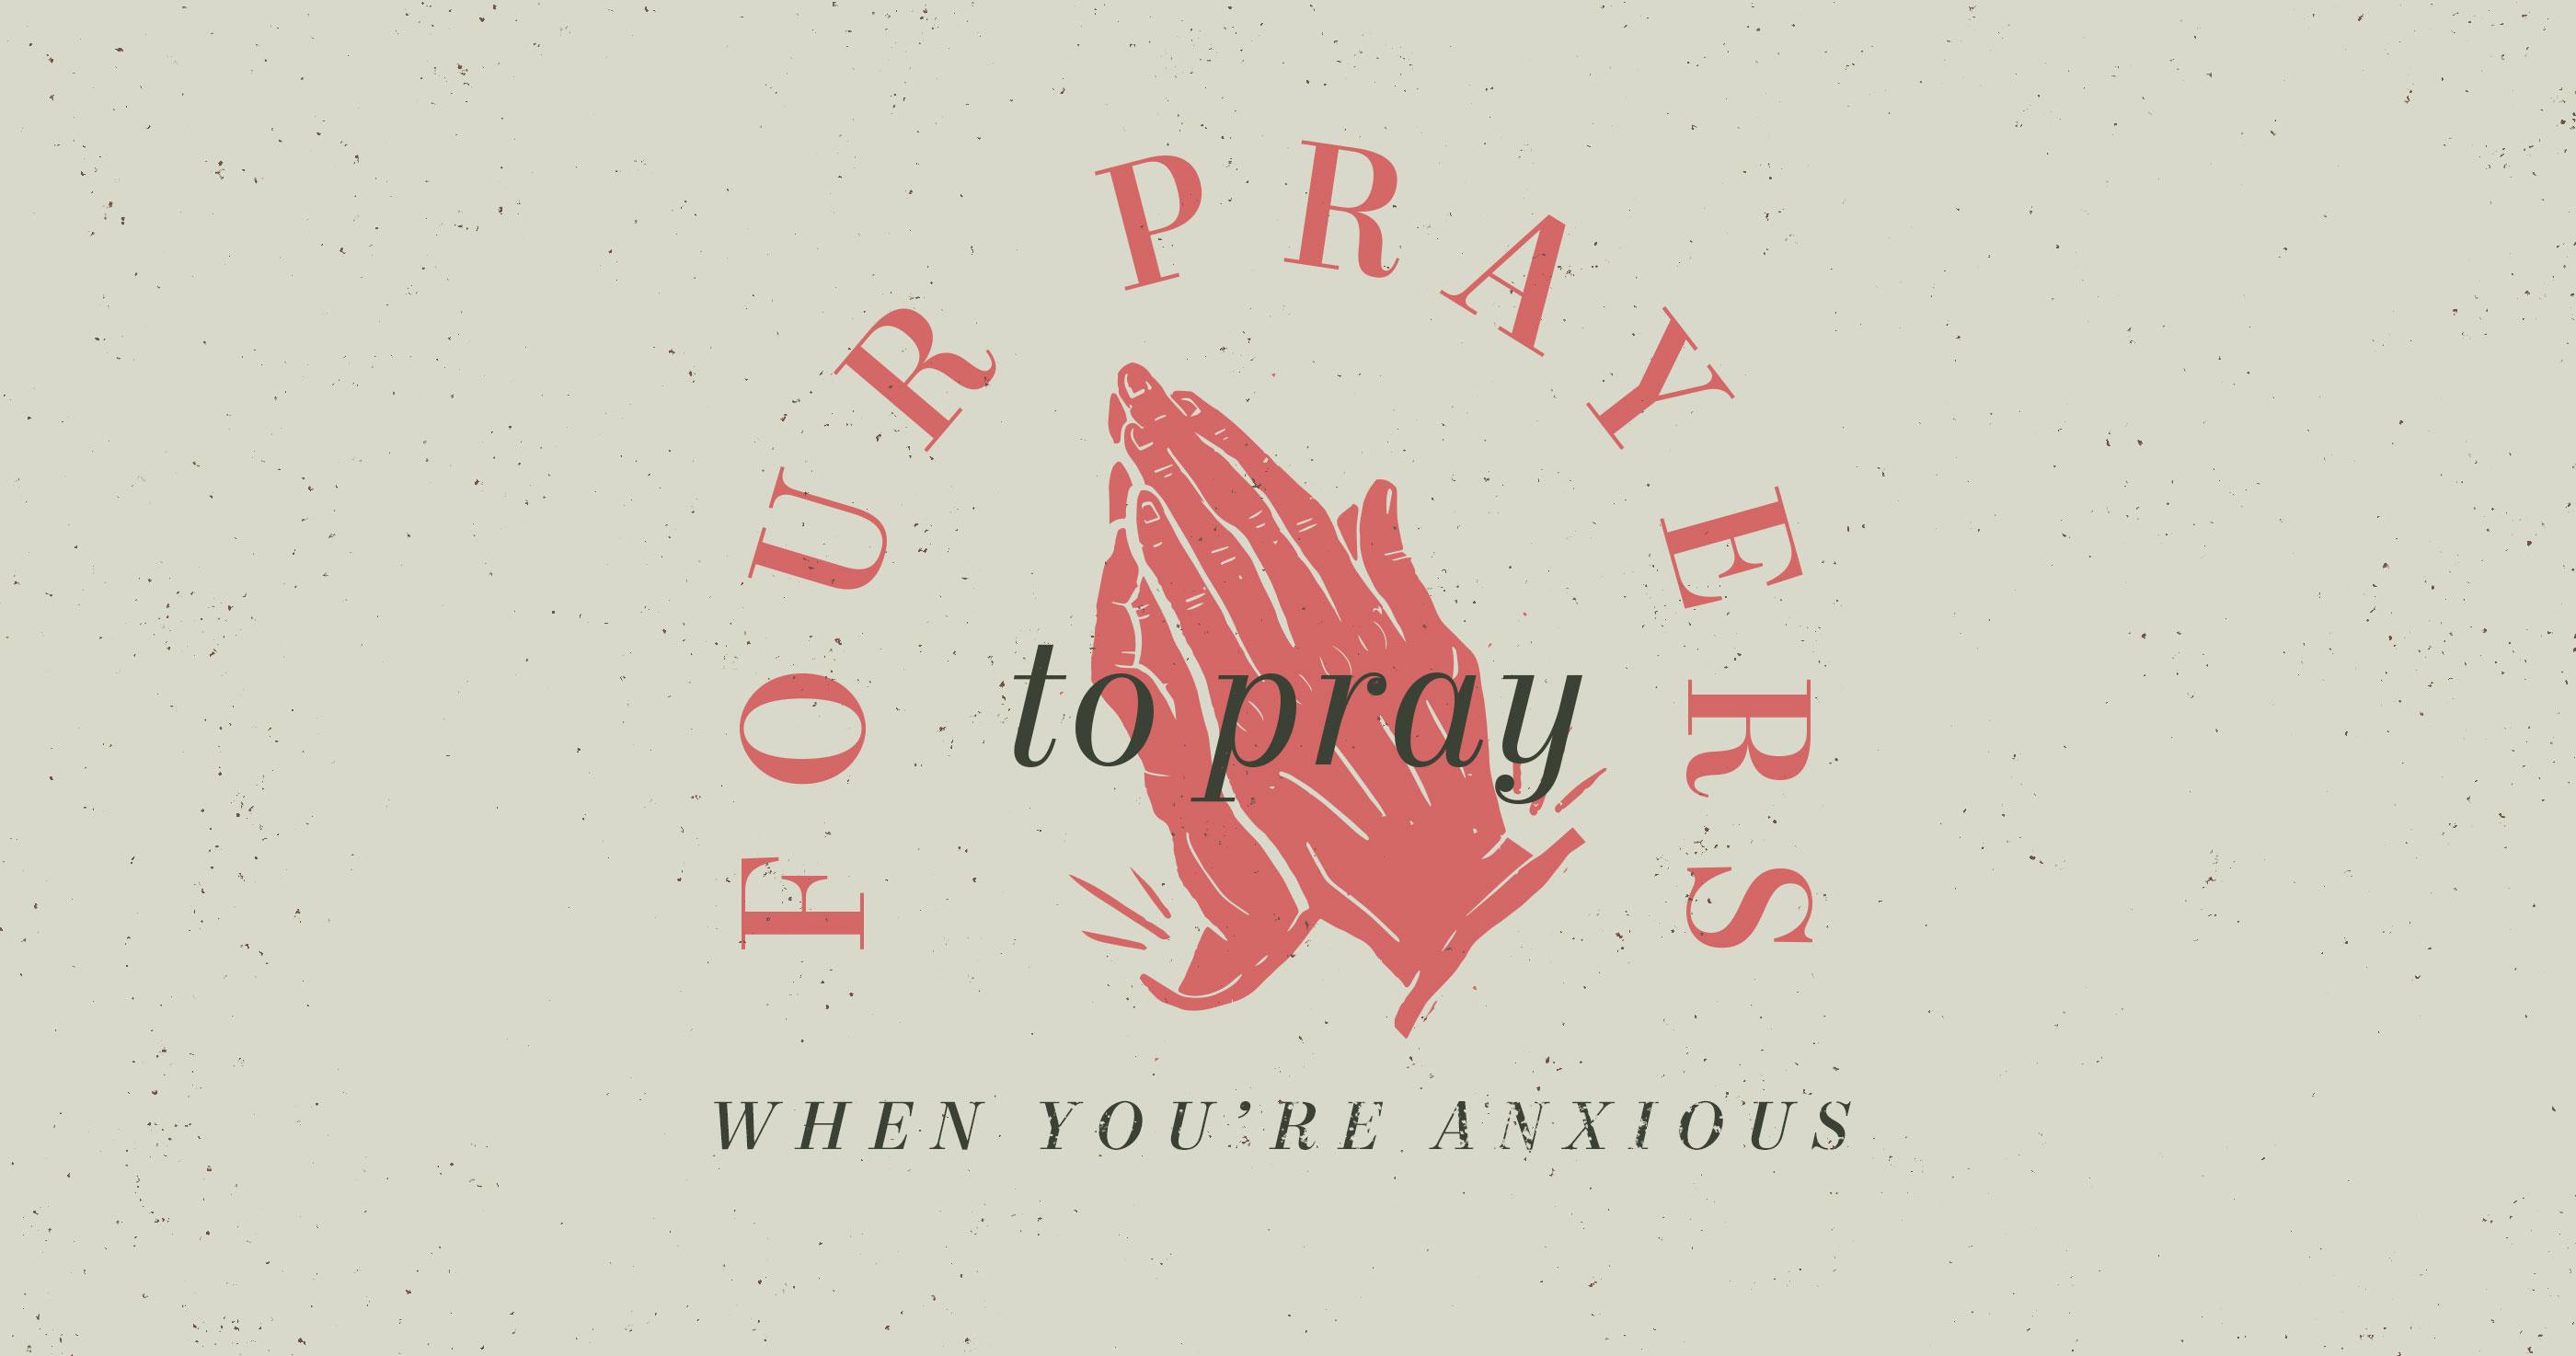 Four Prayers to Pray When You're Anxious